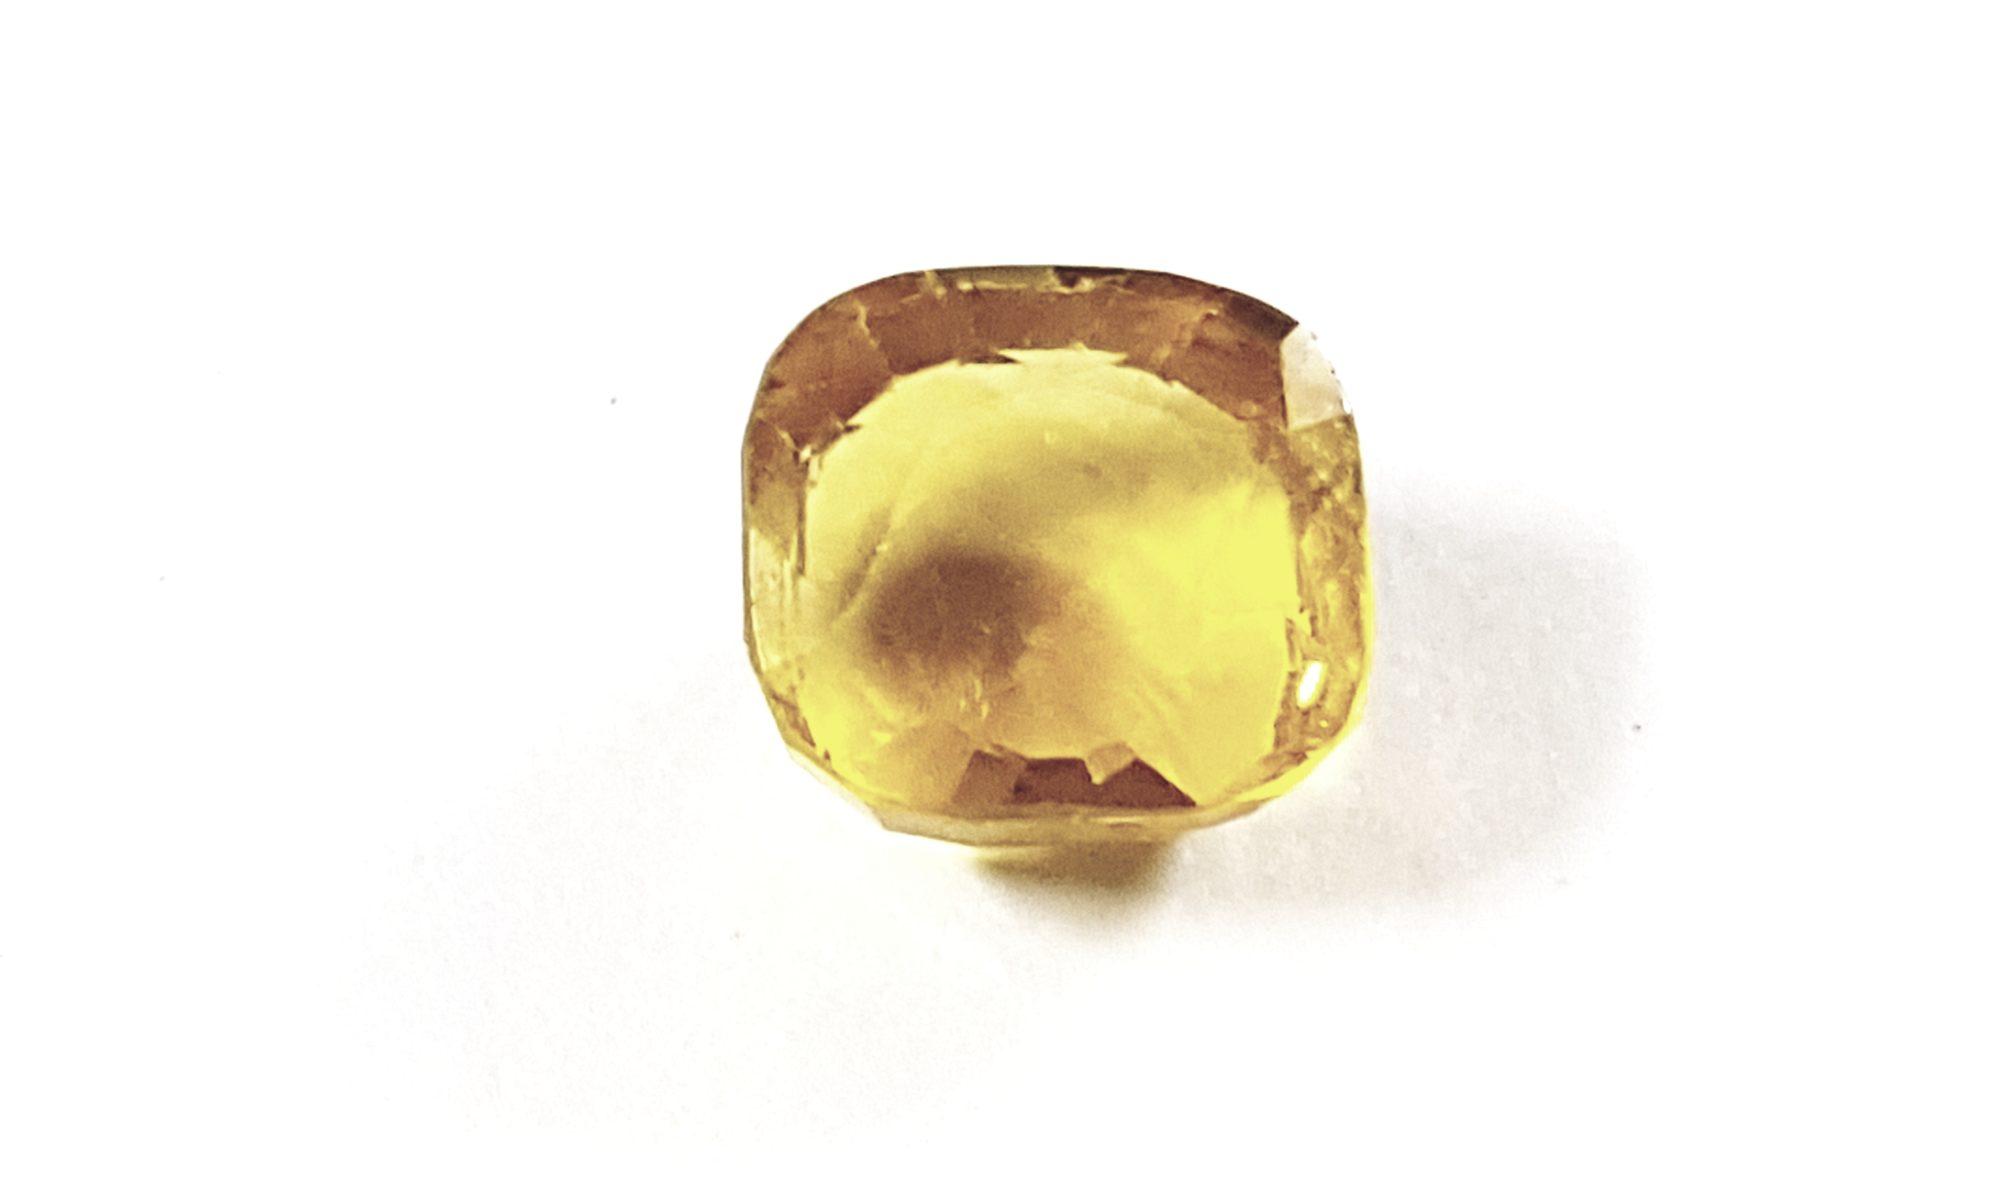 yellow flourspar or yellow florspar - rudraveda.com (15)